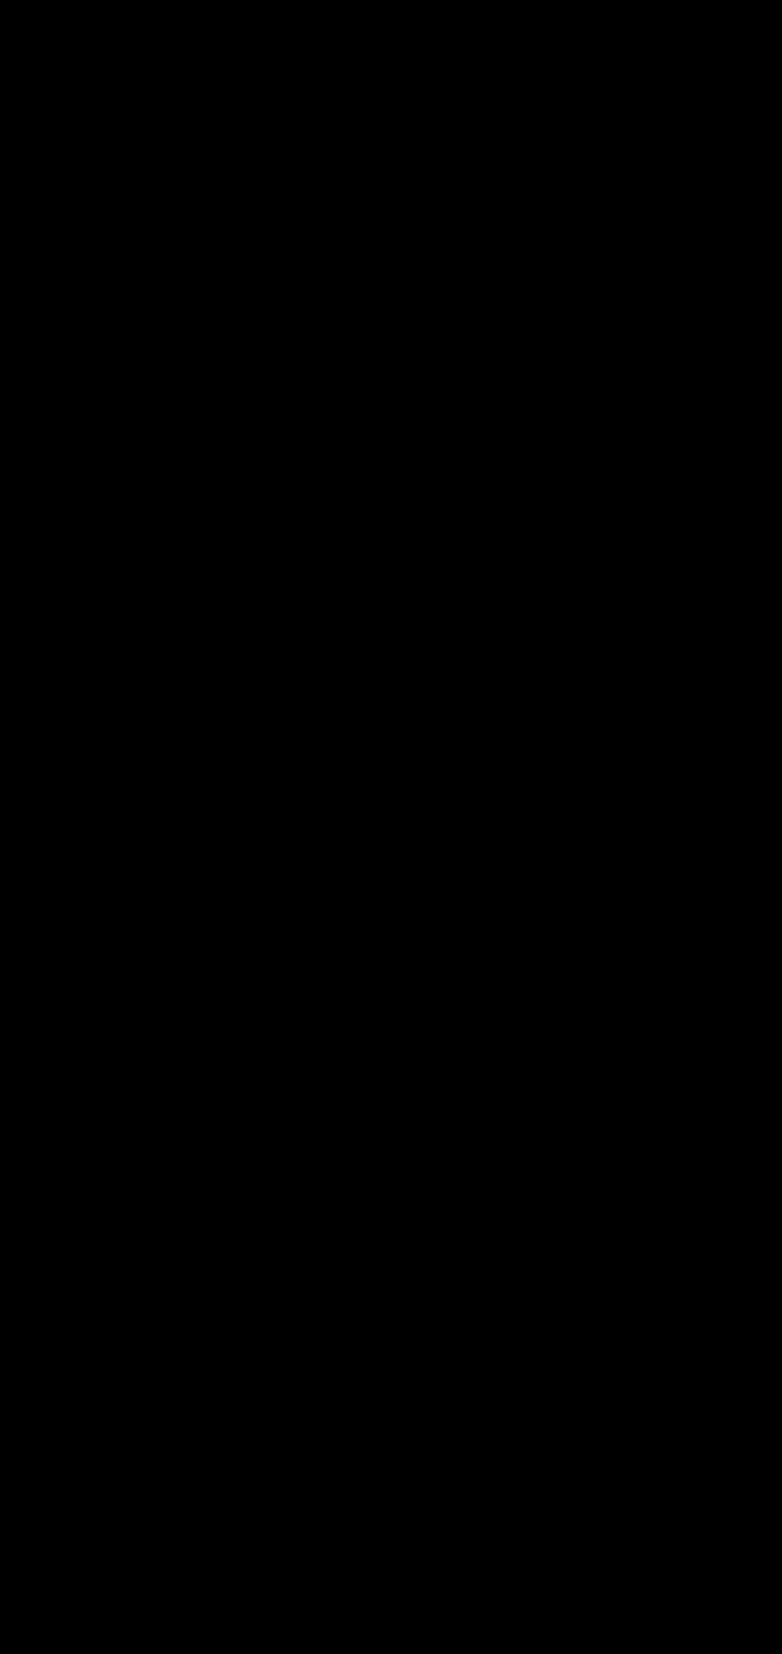 1. space left parenthesis a right parenthesis space W e space k n o w space t h a t space 1 space k m equals 1000 space m therefore 75 space k m equals 75 cross times 1000 m space space space space space space space space space space space space space equals 75000 space m T h u s comma space p e r c e n t a g e space o f space t h e space r a t i o space 825 space m space o f space 75 space k m equals 825 over 75000 cross times 100 equals 1.1 % left parenthesis b right parenthesis space W e space k n o w space t h a t space 1 space h o u r equals 60 space m i n s. therefore 2 space h o u r s equals 2 cross times 60 equals 120 space m i n s T h u s comma space p e r c e n t a g e space o f space t h e space r a t i o space 225 space m i n s space o f space 2 space h o u r s equals 225 over 120 cross times 100 equals 187.5 %  2. space left parenthesis i right parenthesis L e t space apostrophe x apostrophe space b e space t h e space n u m b e r space w h o s e space 8 % space i s space 16. T h u s comma space 8 % space o f space x space equals 16 therefore 8 over 100 cross times x equals 16 M u l t i l y space 100 over 8 space t o space b o t h space t h e space s i d e s comma space w e space h a v e comma 100 over 8 cross times 8 over 100 cross times x equals 100 over 8 cross times 16 therefore 1 cross times x equals fraction numerator 100 over denominator up diagonal strike 8 end fraction cross times up diagonal strike 16 squared end strike therefore x equals 200 T h e r e f o r e comma space 8 % space o f space 200 space i s space 16  left parenthesis i i right parenthesis L e t space apostrophe x apostrophe space b e space t h e space n u m b e r space w h o s e space 6 1 fourth % space i s space 4. T h u s comma space 6 1 fourth % space o f space x space equals 4 therefore 25 over 4 % space o f space x equals 4 therefore fraction numerator 25 over denominator 4 cross times 100 end fraction cross times x equals 4 M u l t i l y space 400 over 25 space t o space b